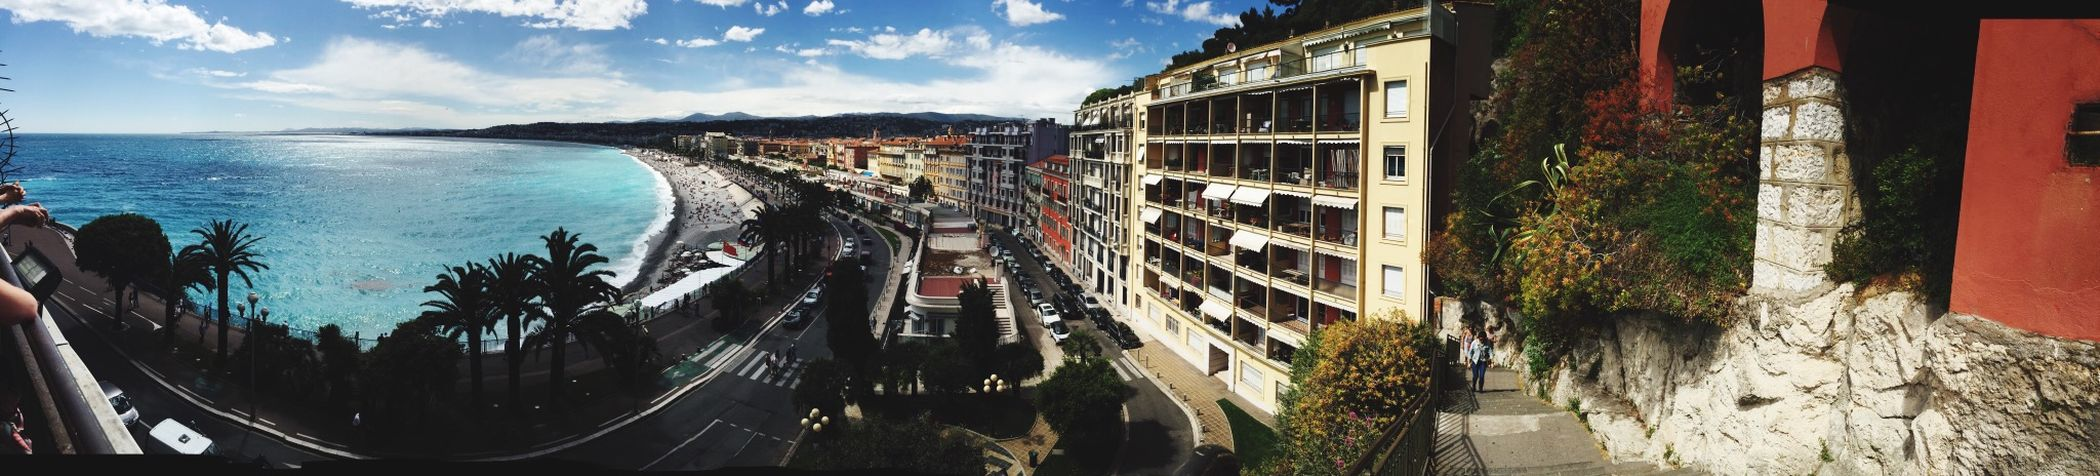 Panorama Streetphotography